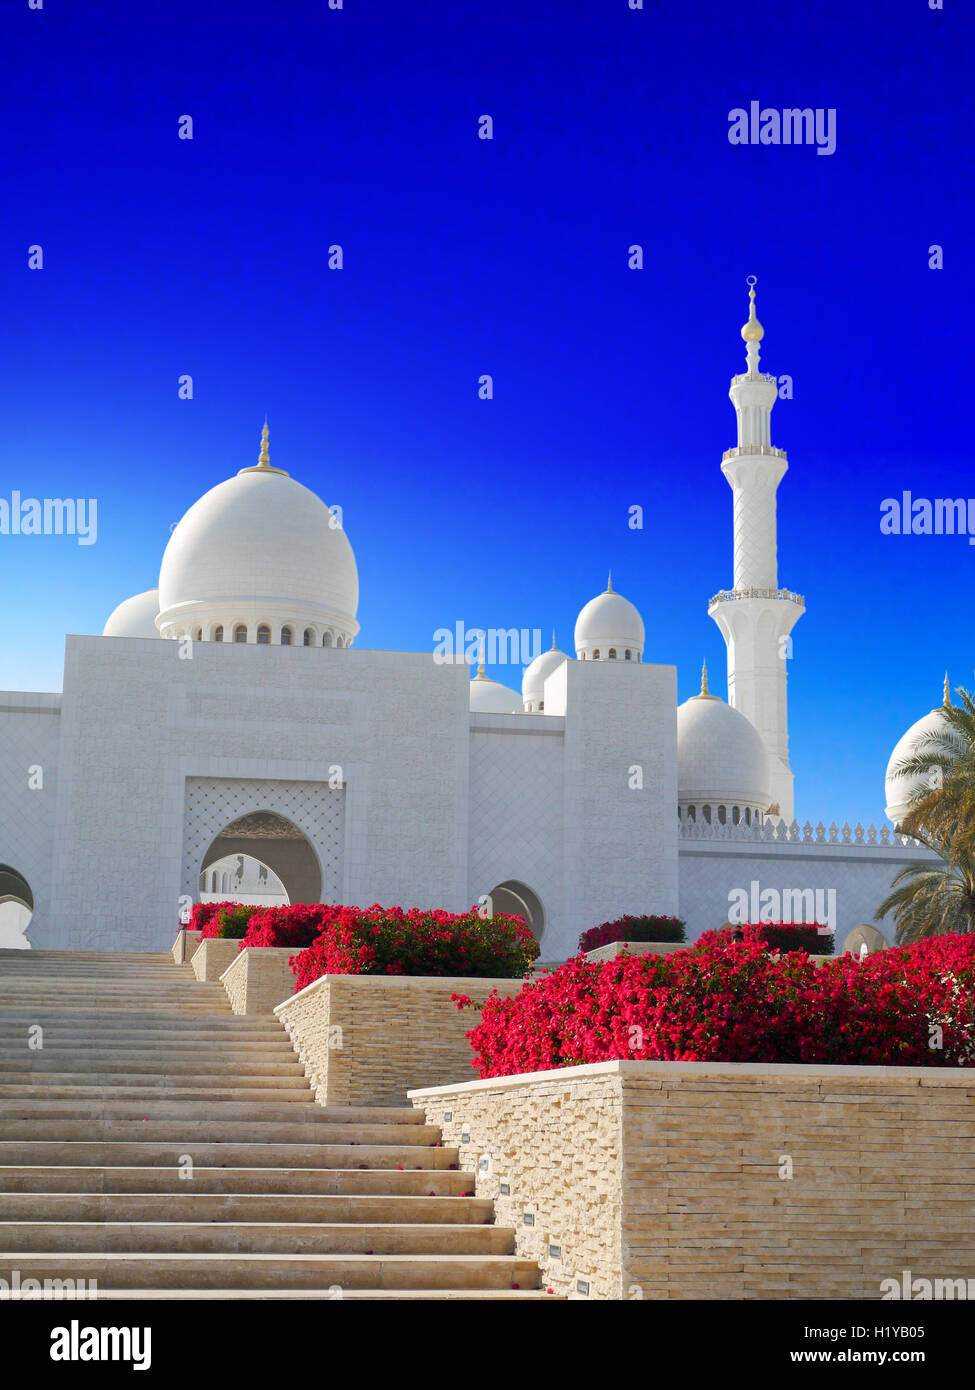 Moschea Sheikh Zayed di Abu Dhabi Immagini Stock